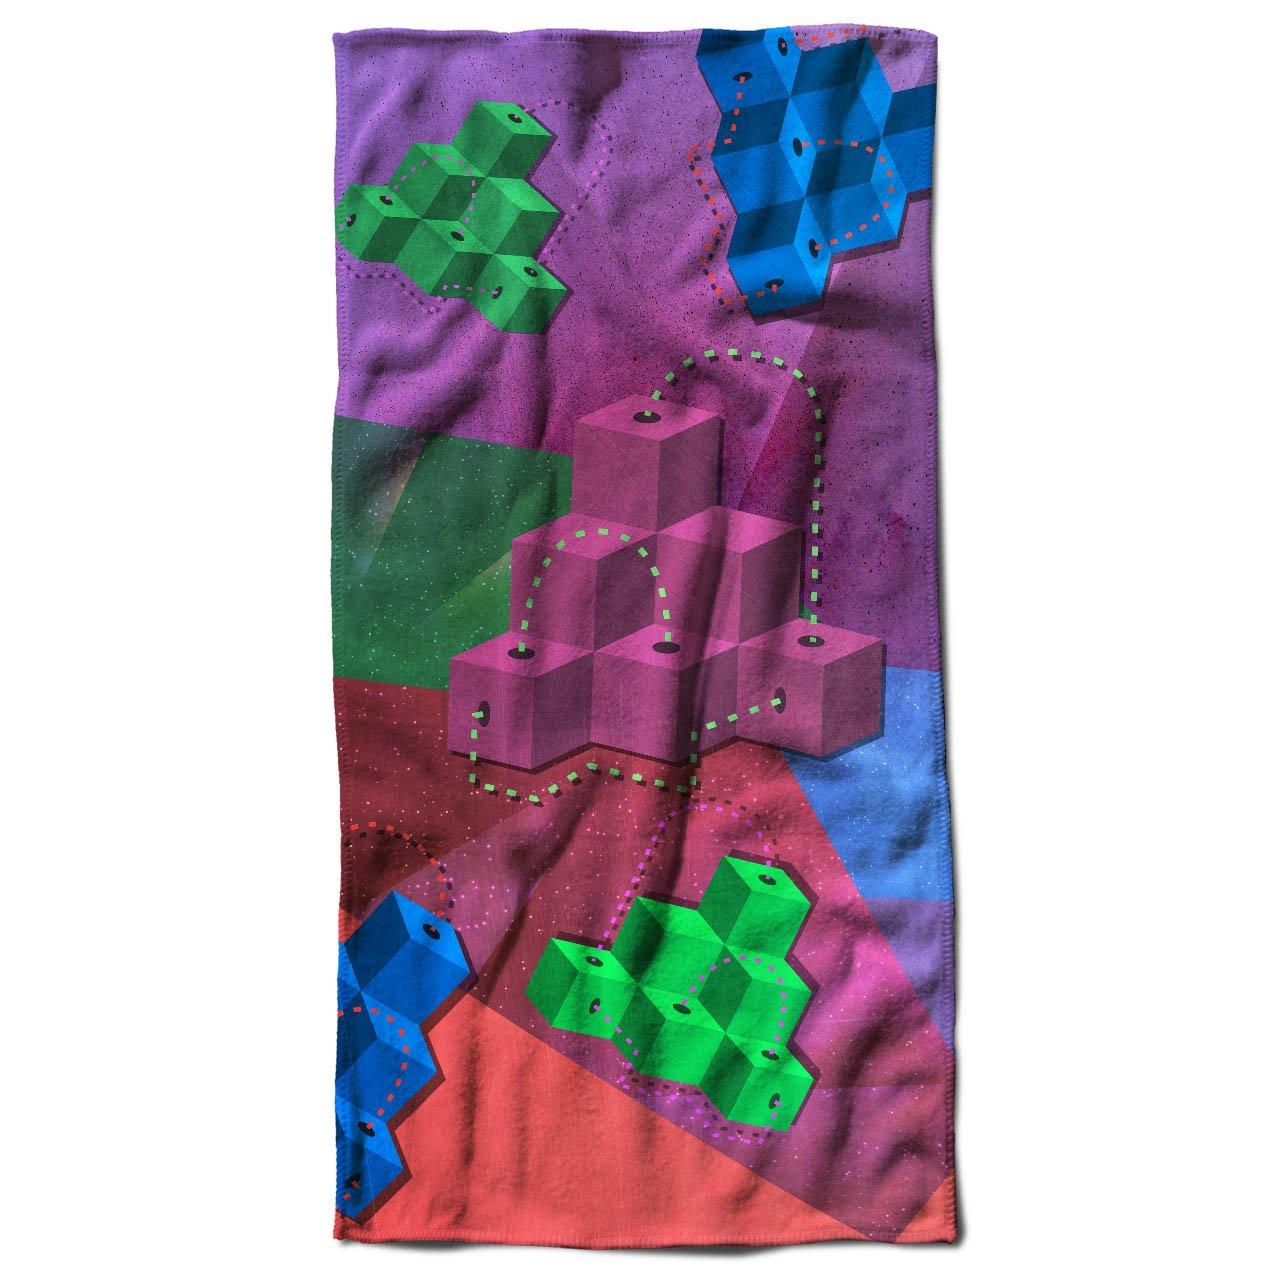 Dados modisch Imprimir Mode geométrico Toalla | Well Coda, microfibra, multicolor, 50cm x 100cm: Amazon.es: Hogar